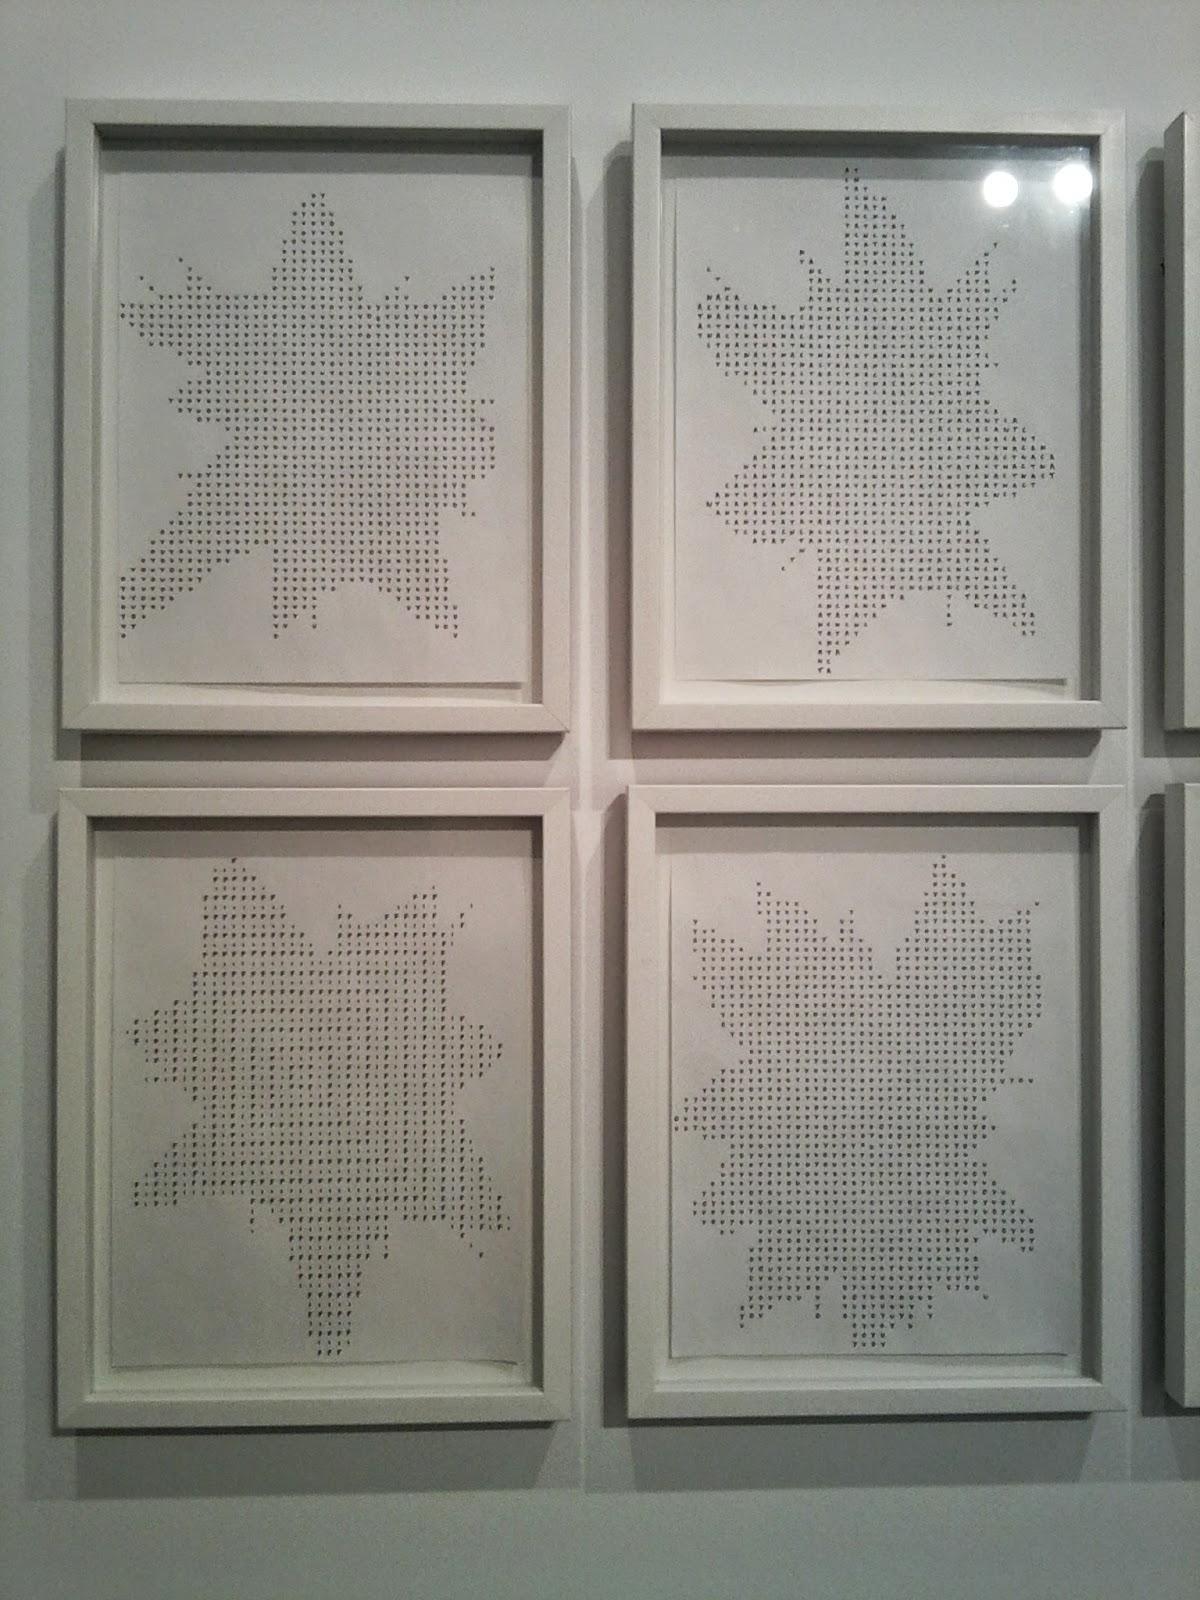 Blog de Arte, Voa-Gallery, Fundación ARCO, Colección, fotografía, Centro de Arte Alcobendas, Exposición temporal, Variation, Instalación, Jack Strange,